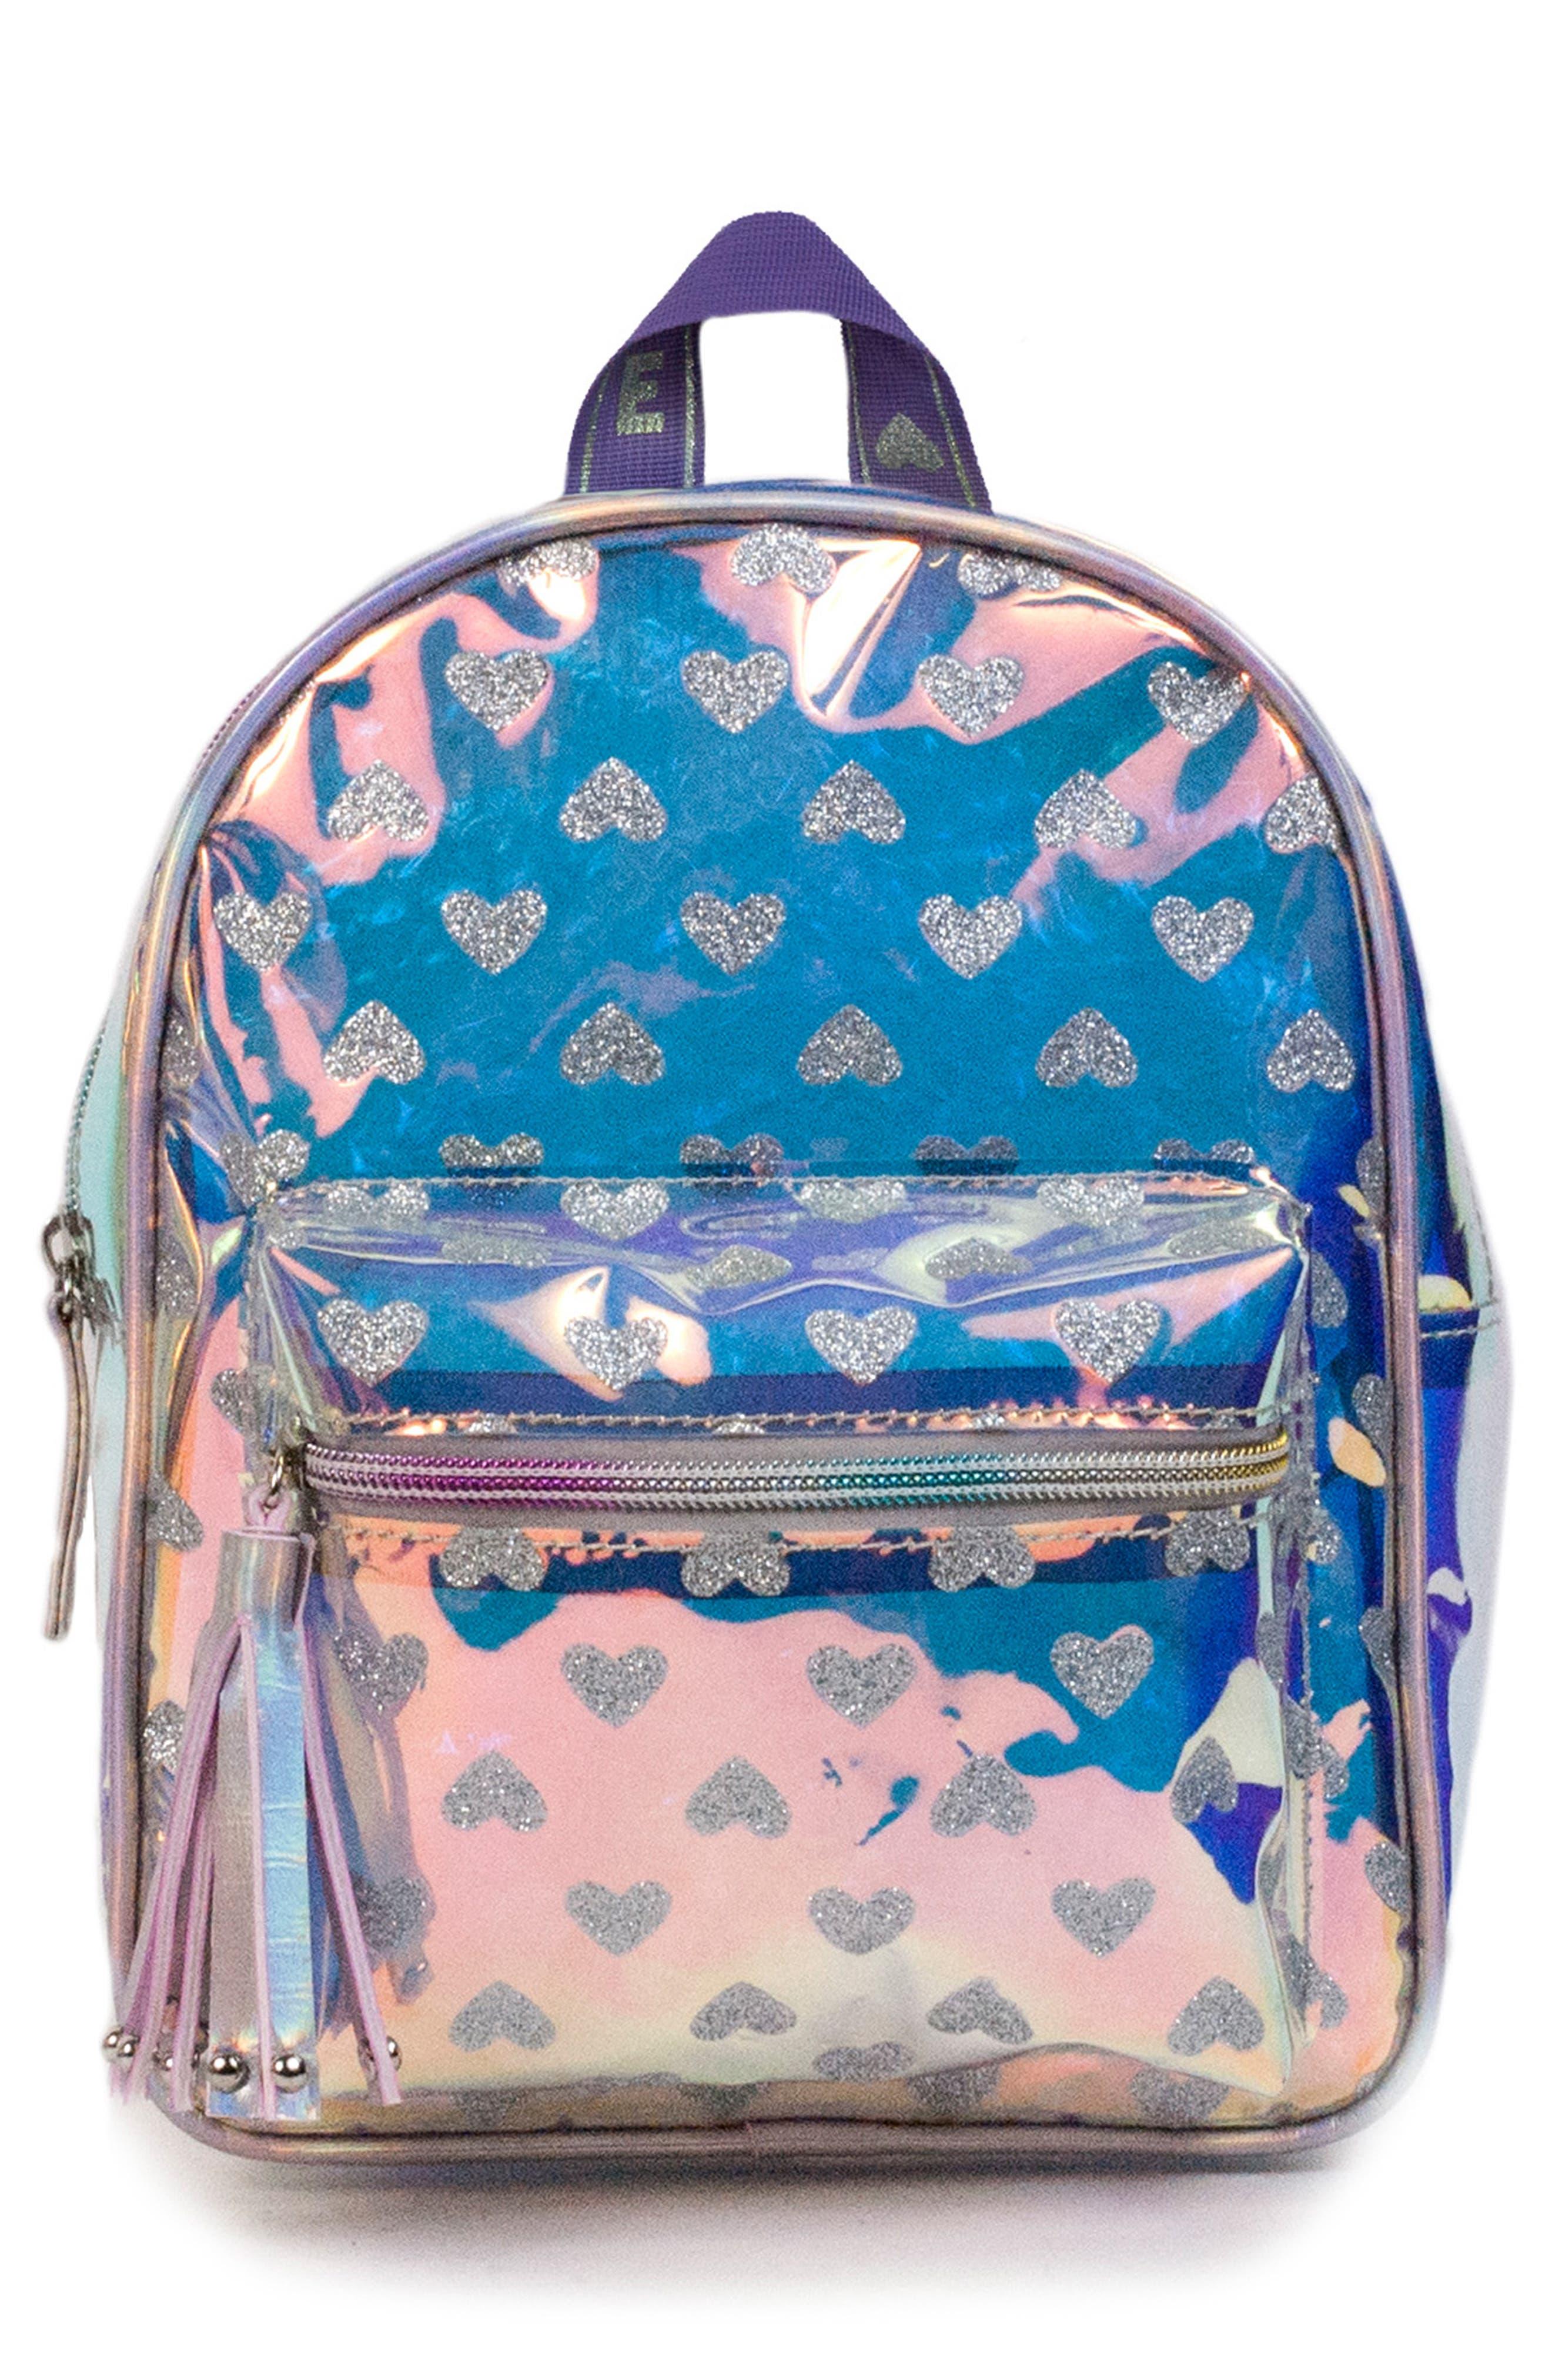 Girls Omg Glitter Heart Iridescent Mini Backpack  Purple